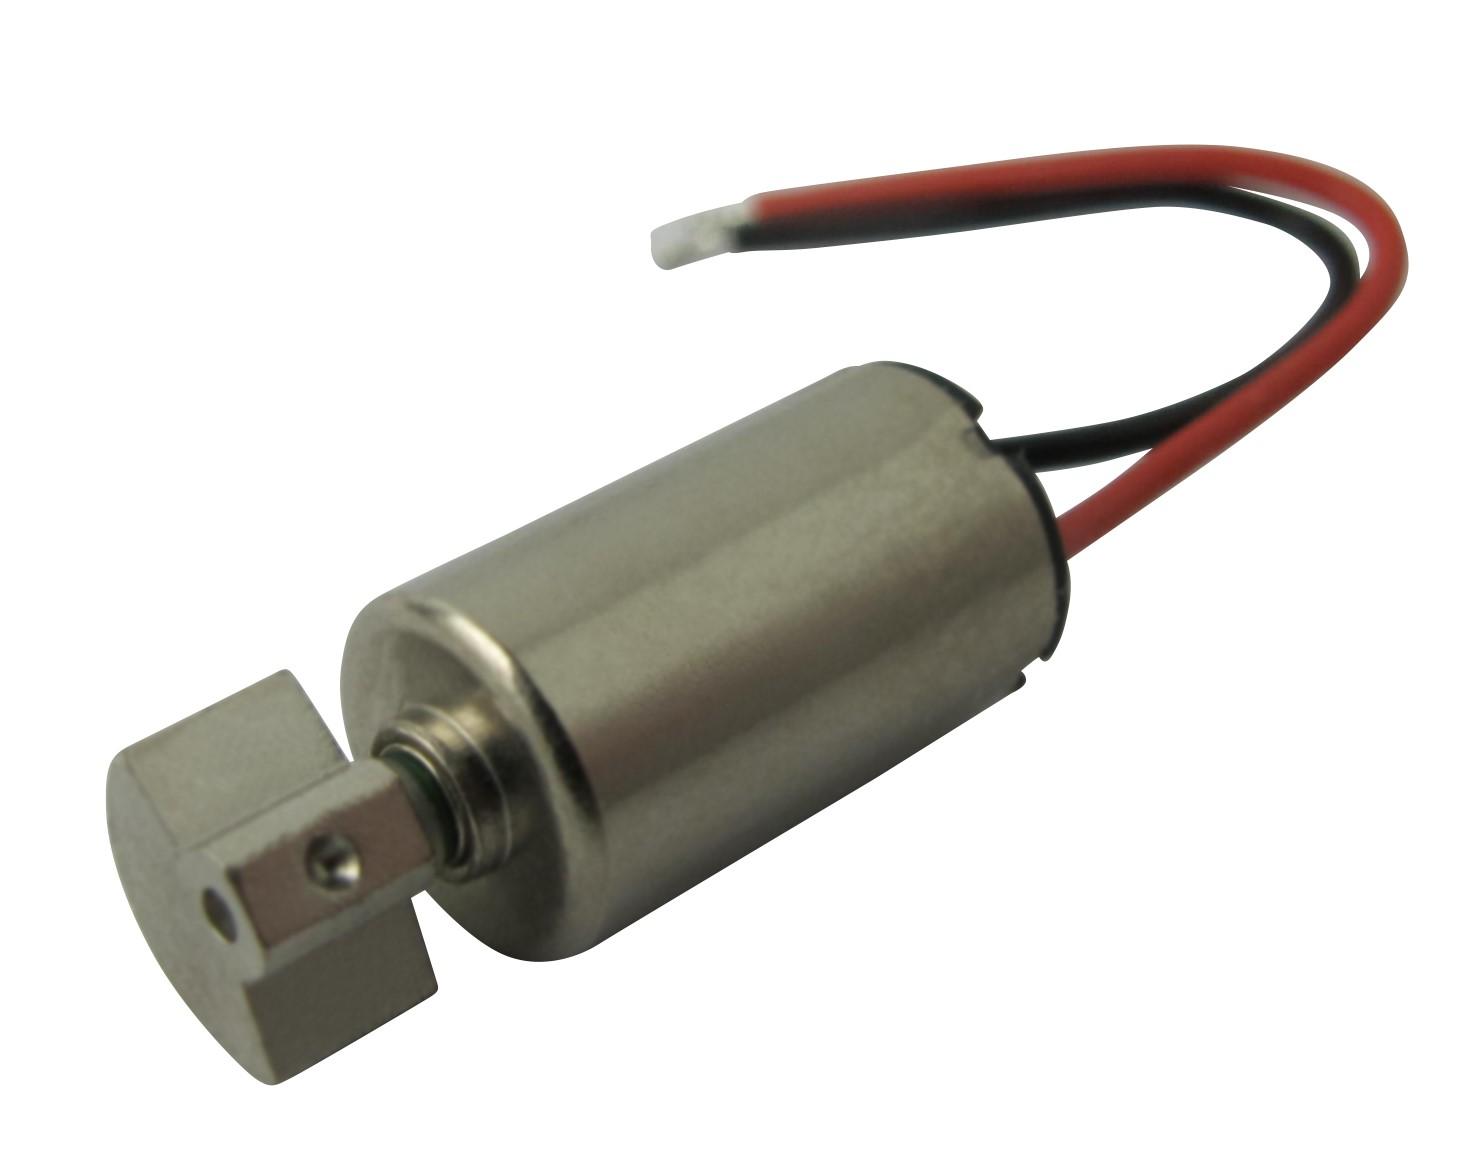 Z6SL2A0060001 Cylindrical Vibrator Motor